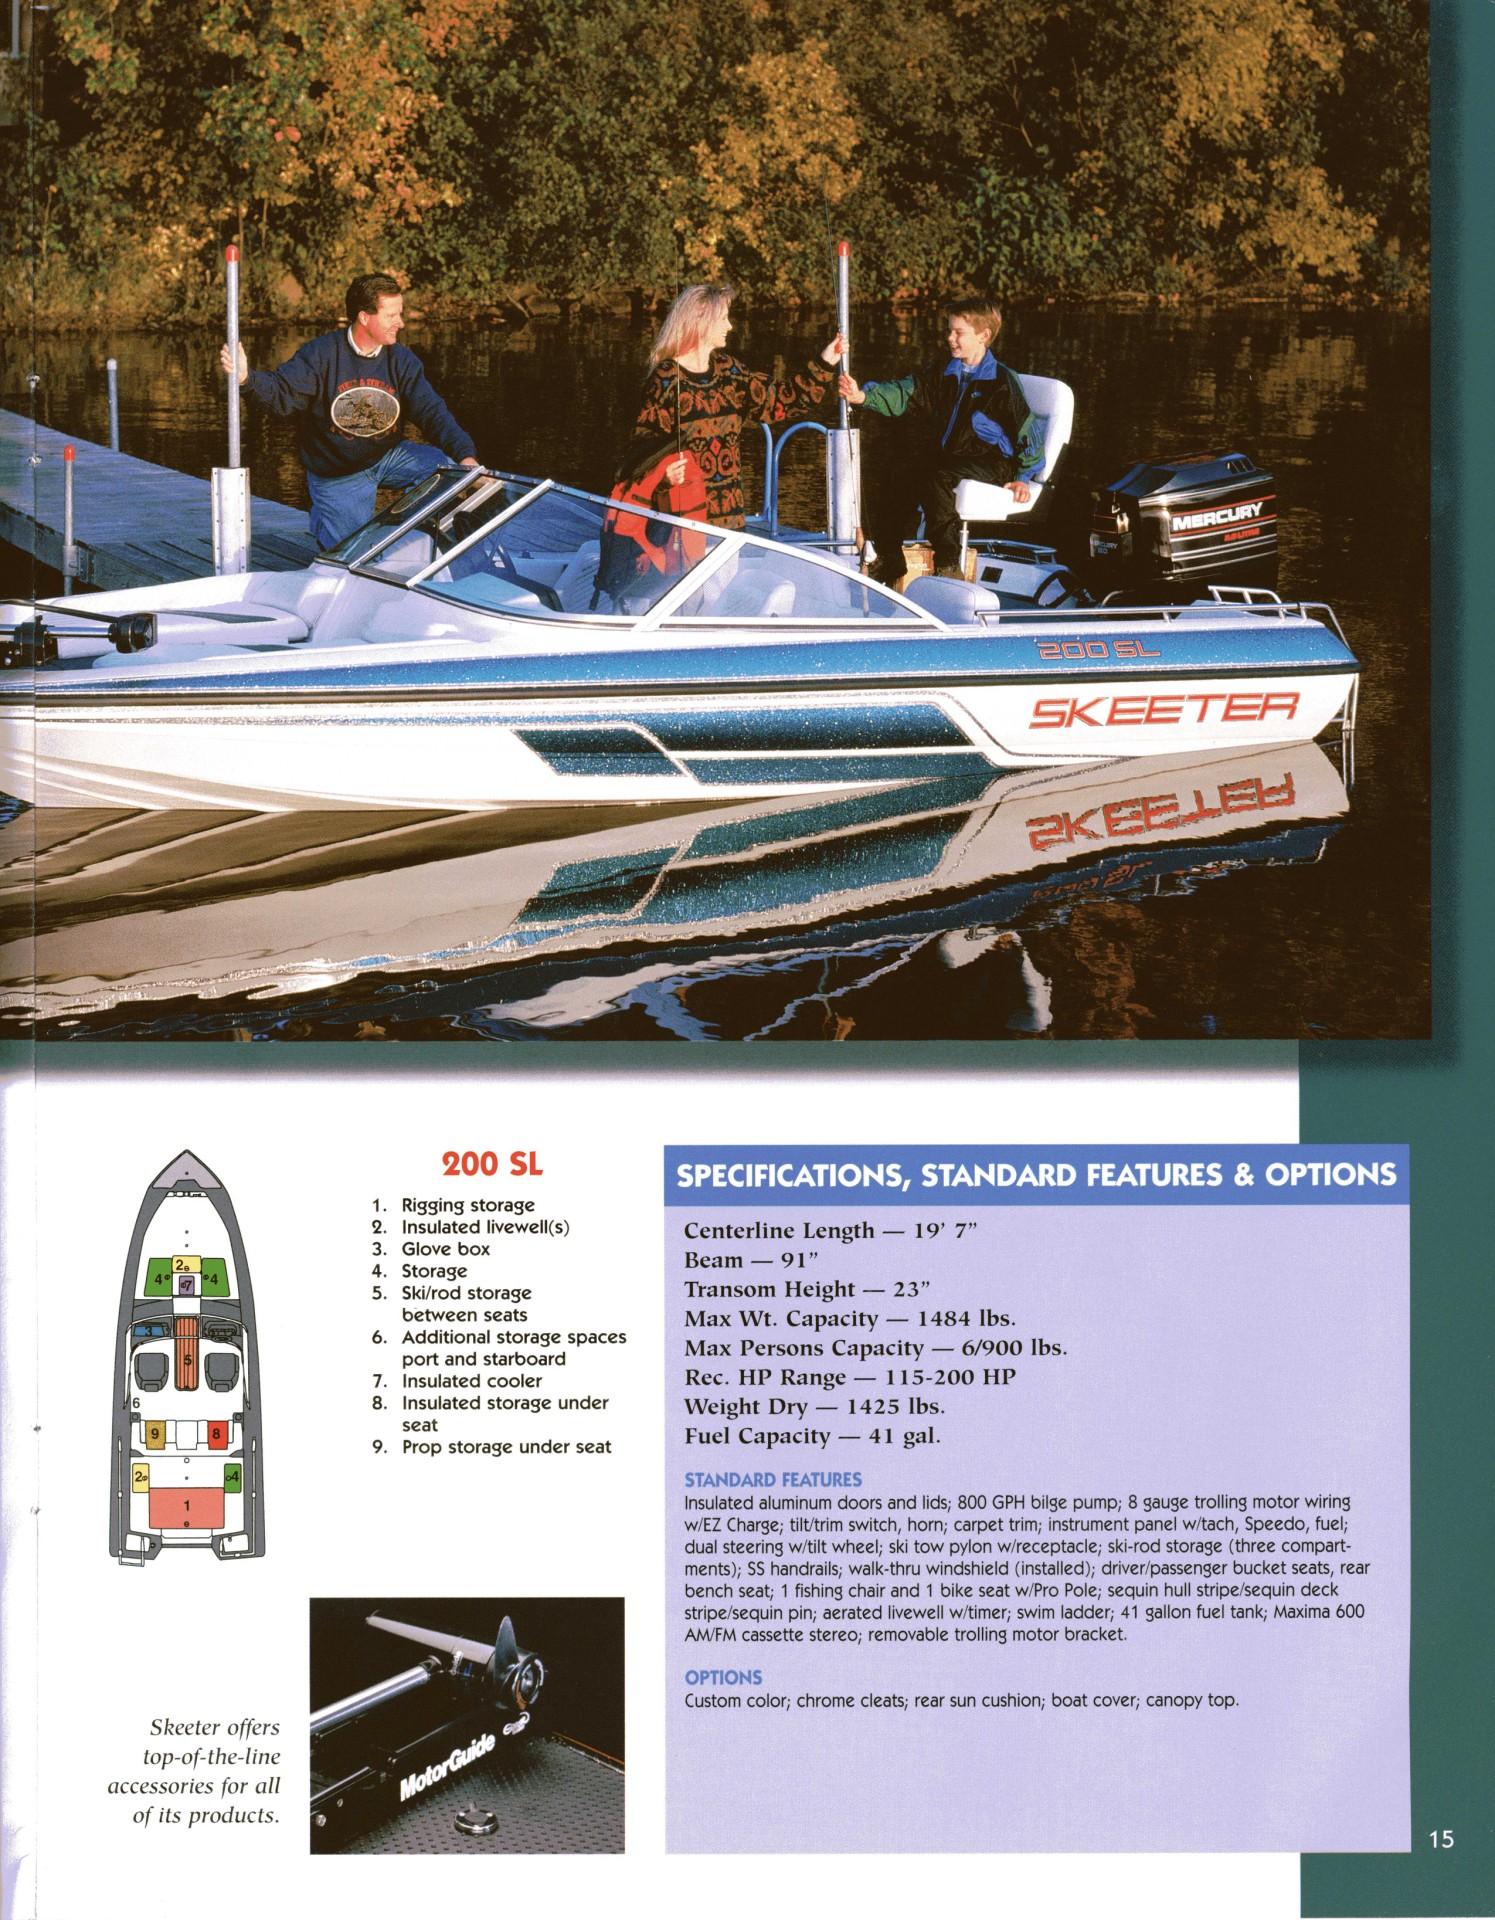 Skeeter Ss90 Wiring Diagram Schematics Boats 1995 Fishing 1997 Bass Boat